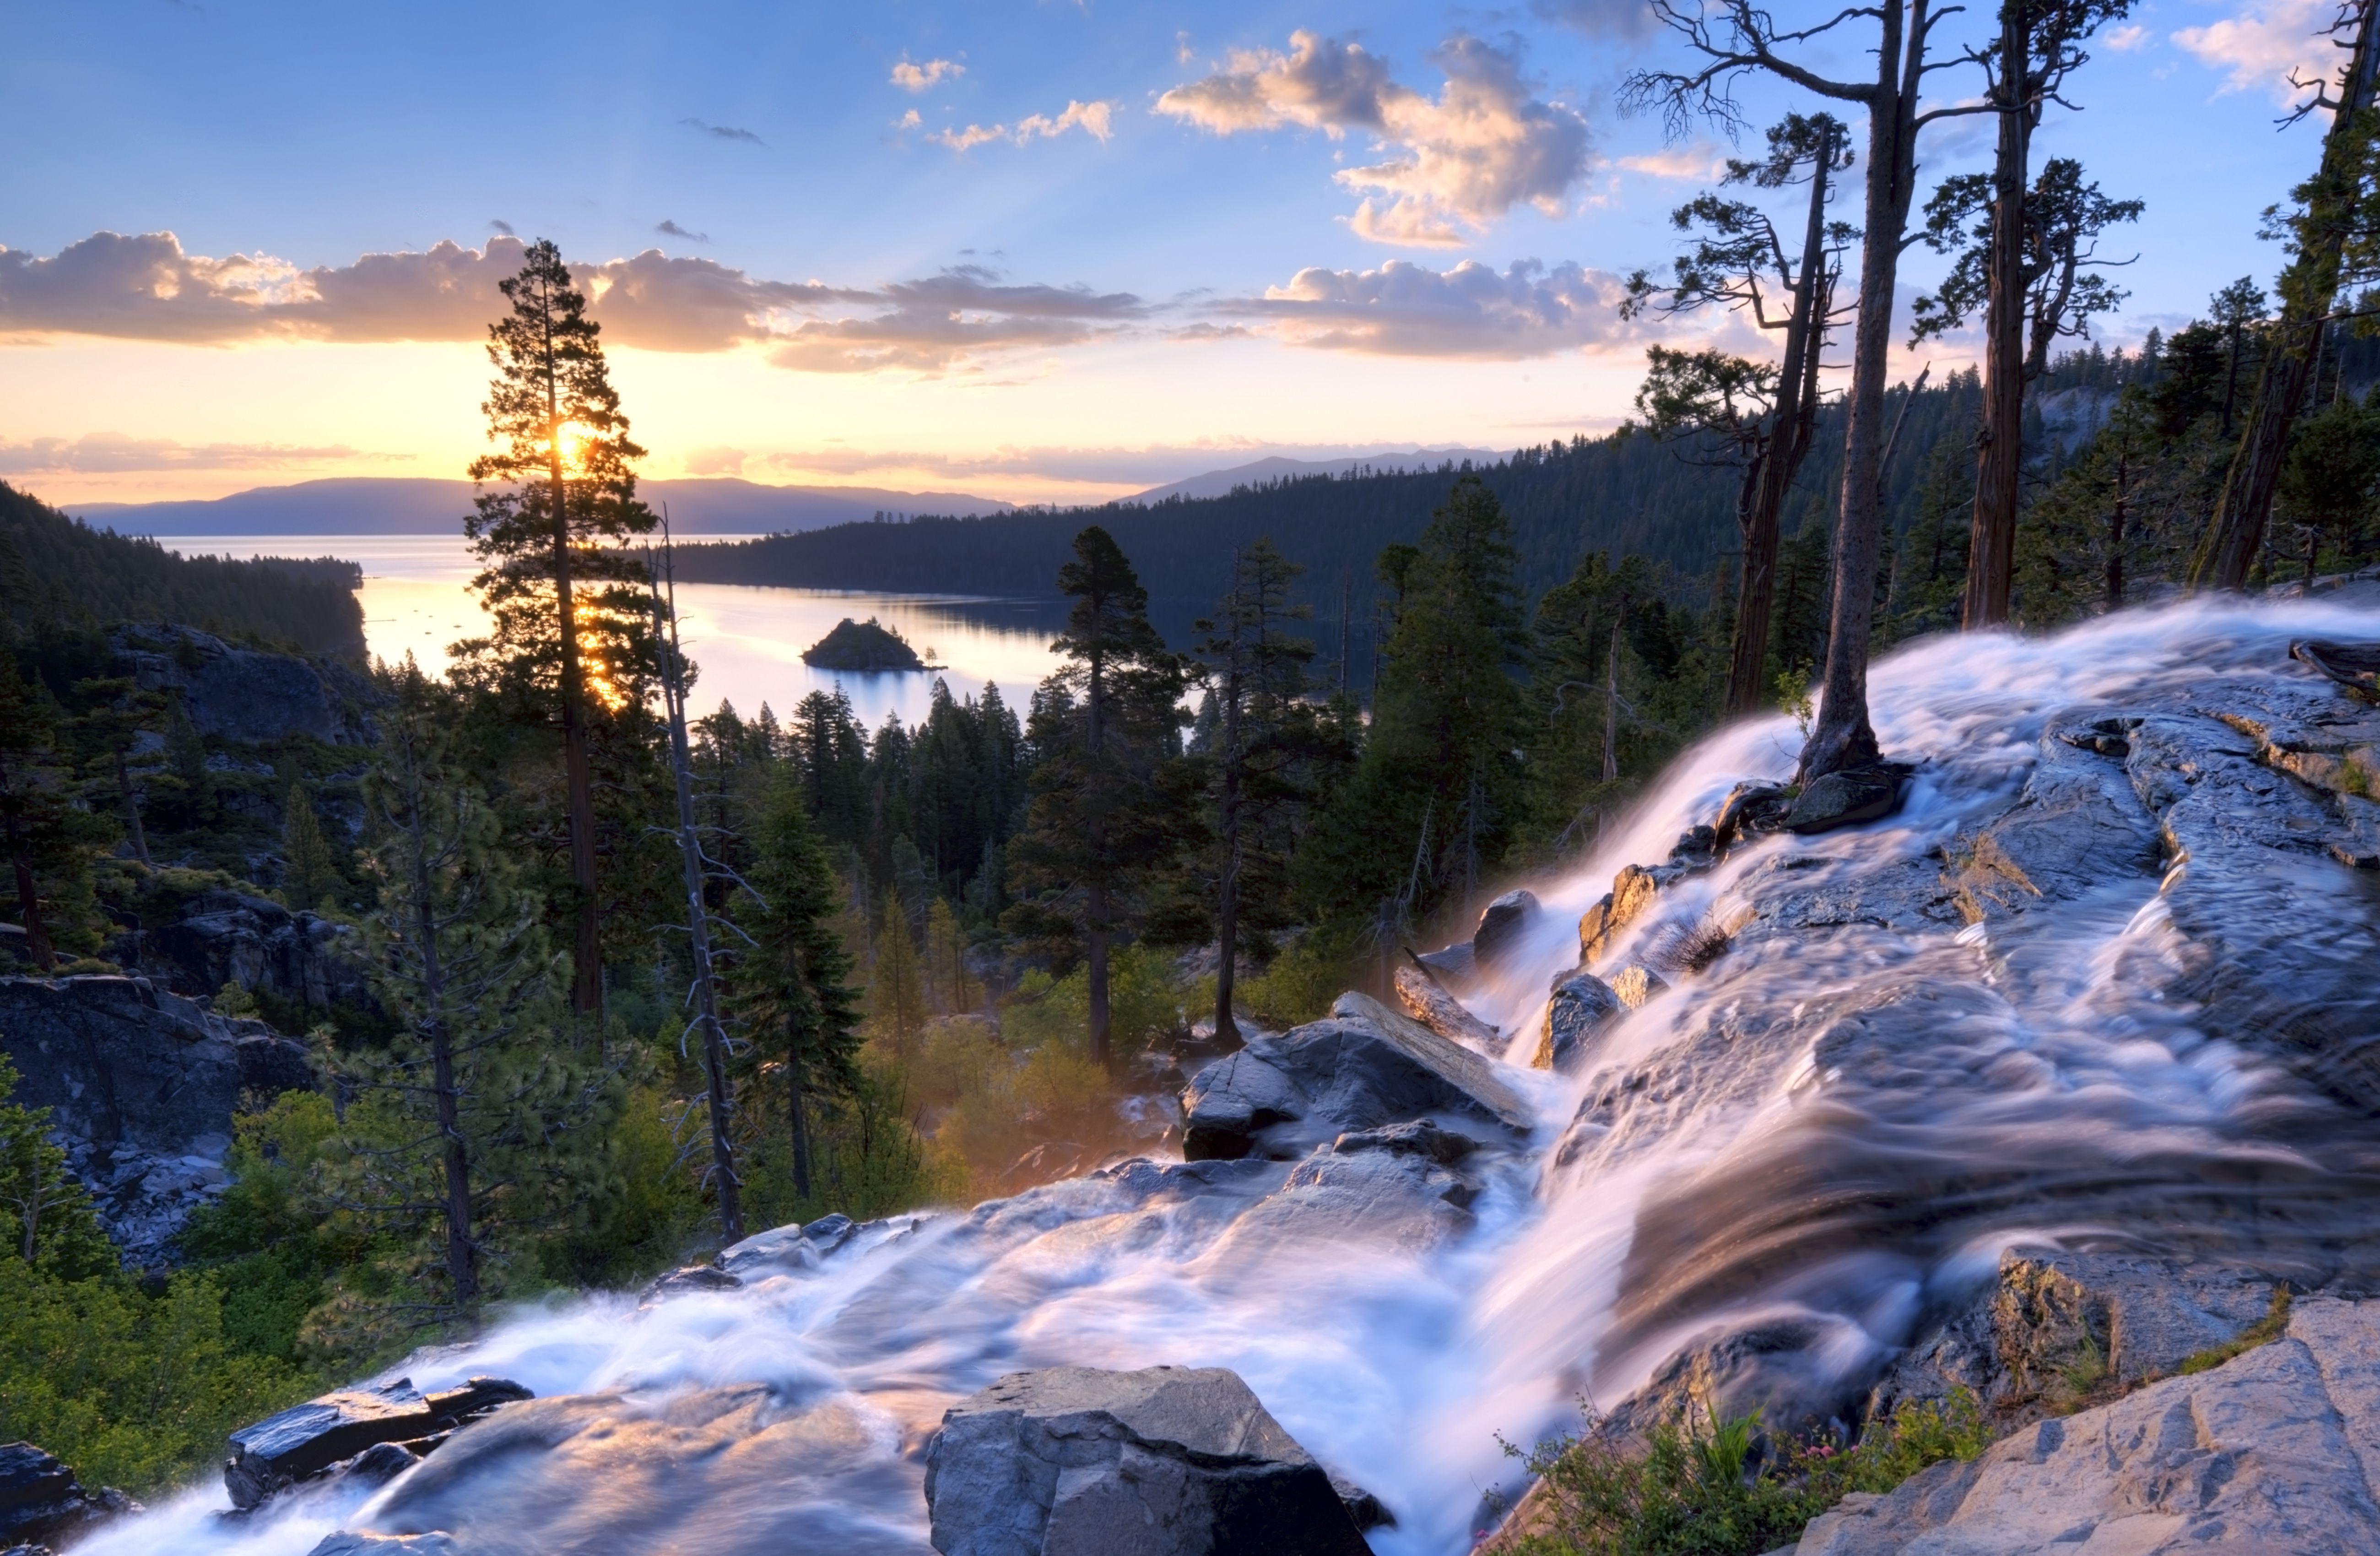 A beautiful sunrise at Eagle Falls at Emerald Bay in Lake Tahoe, California